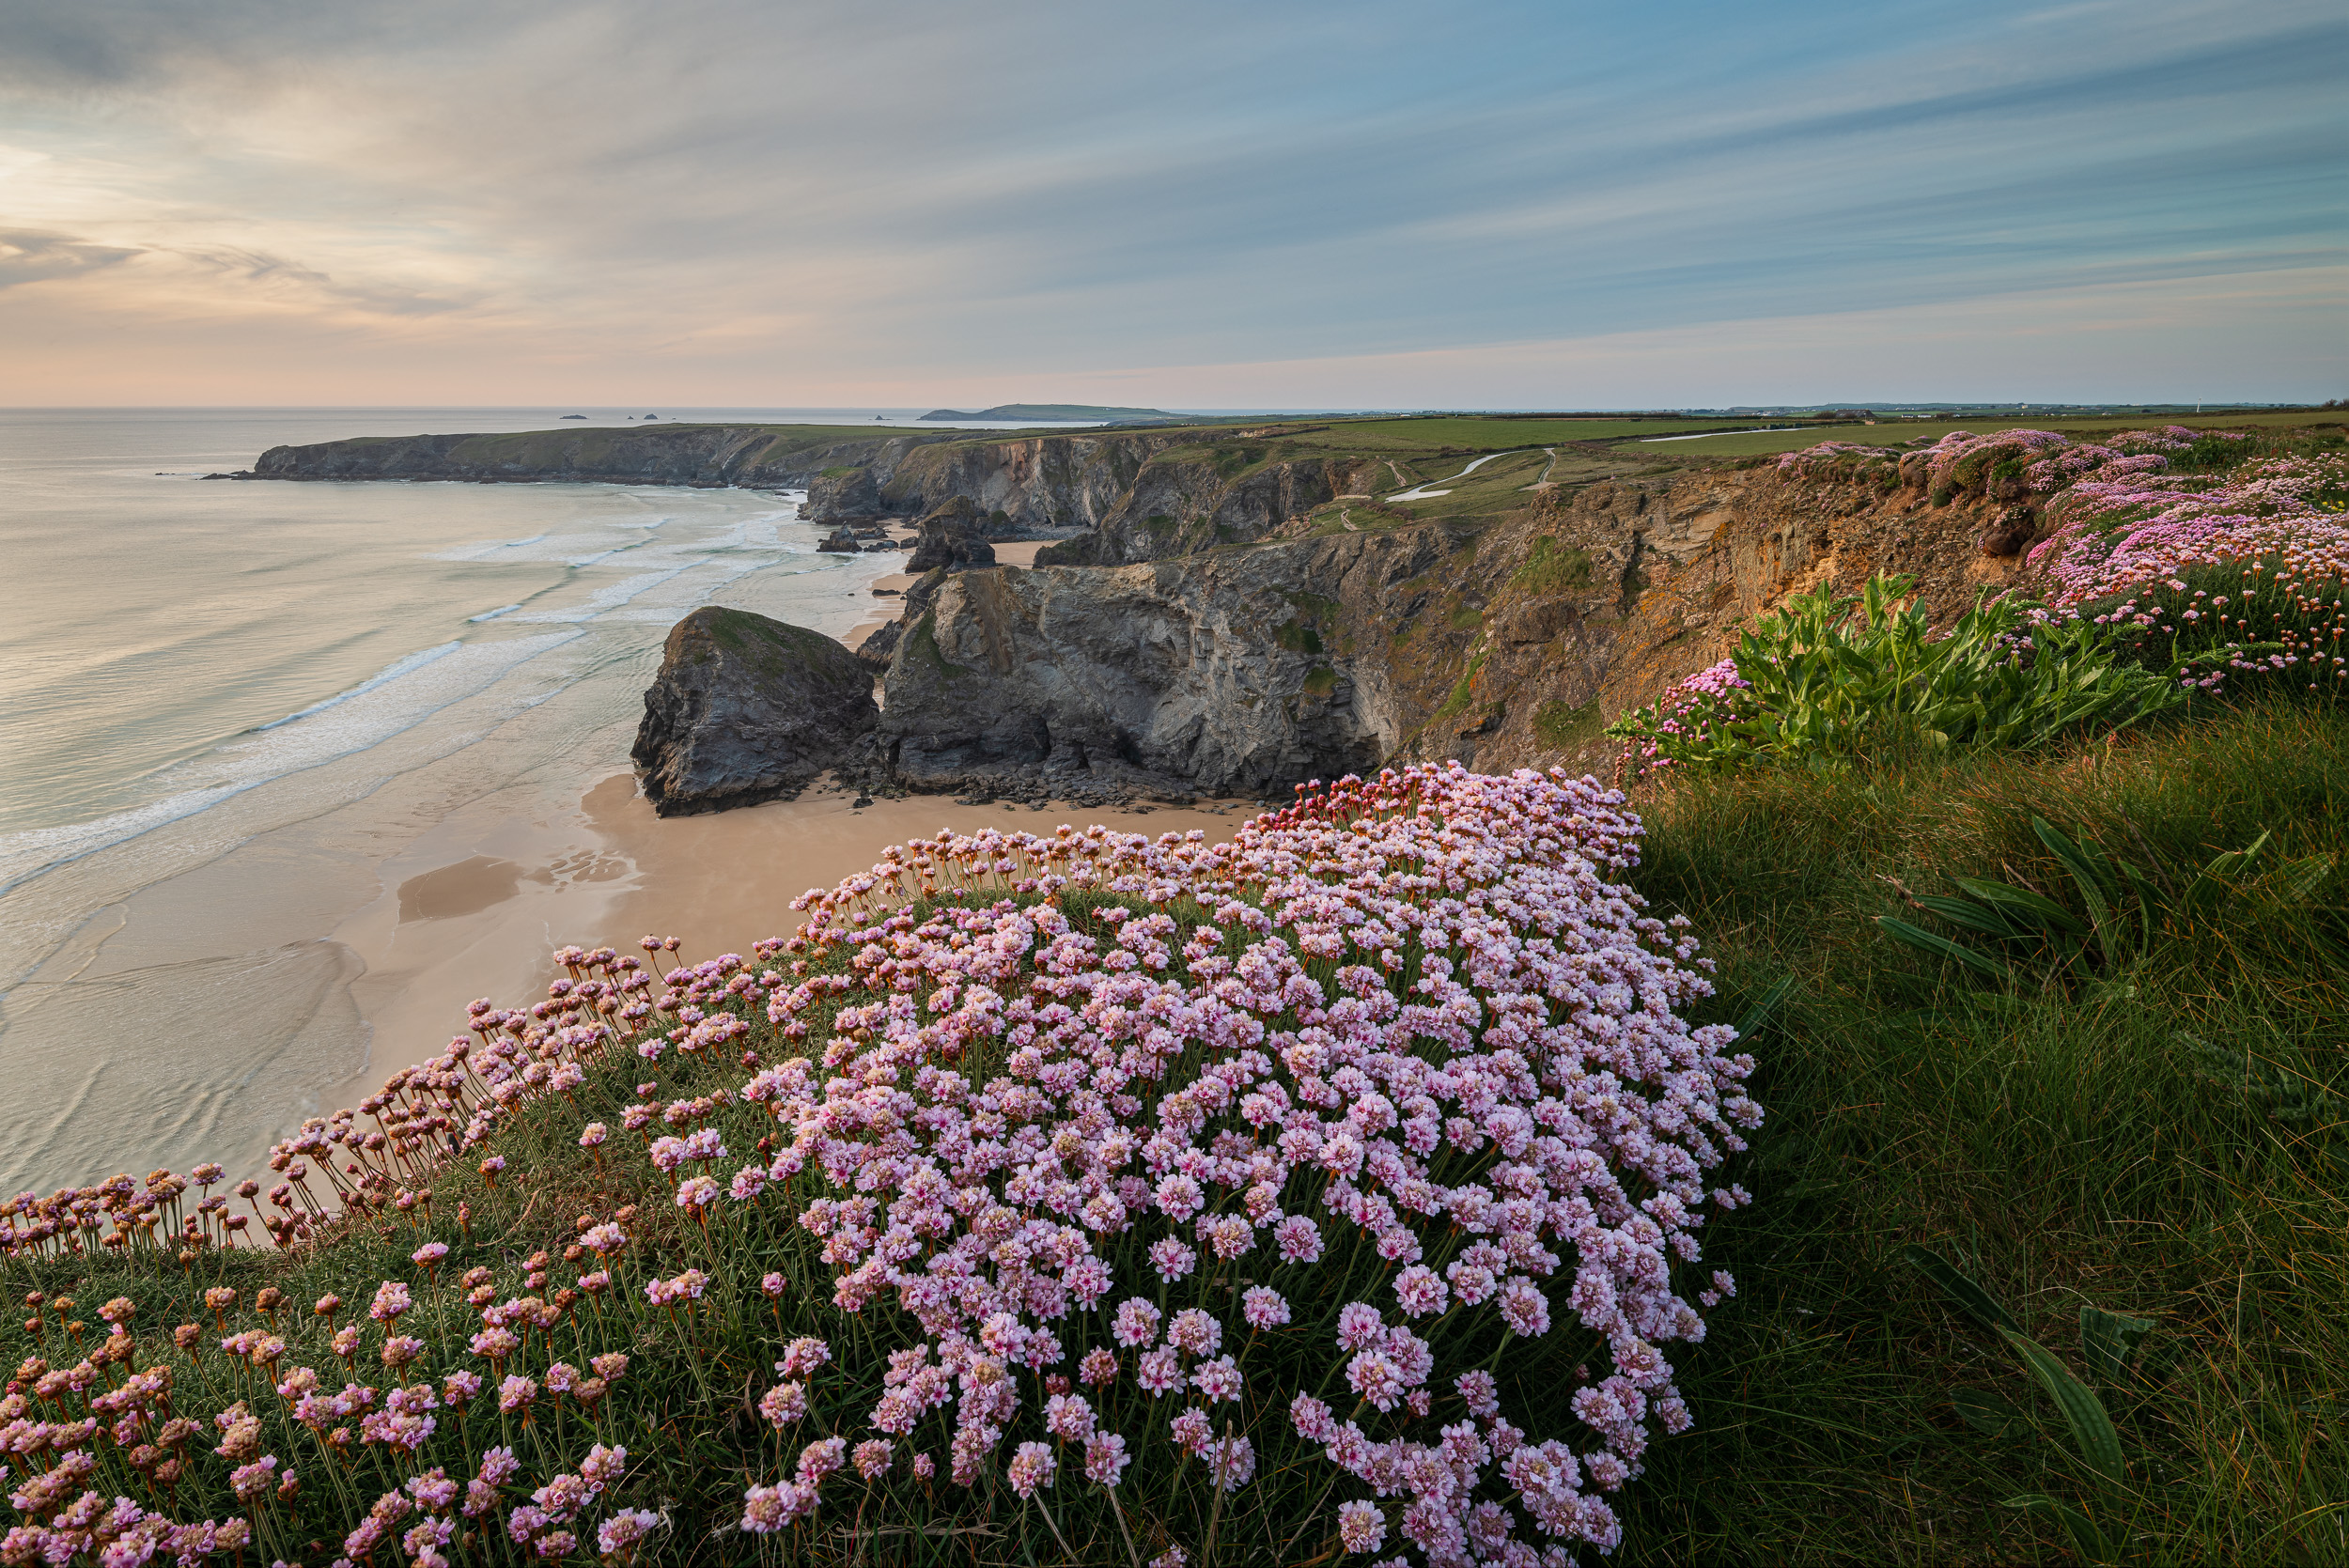 Spring Cliffs at Bedruthan, Bedruthan Steps, Cornwall  - Nikon D850, Nikkor 16-35 mm f/4 at 22 mm, f/11, 1/2 sec at ISO 64, Kase CPL and ND grad.